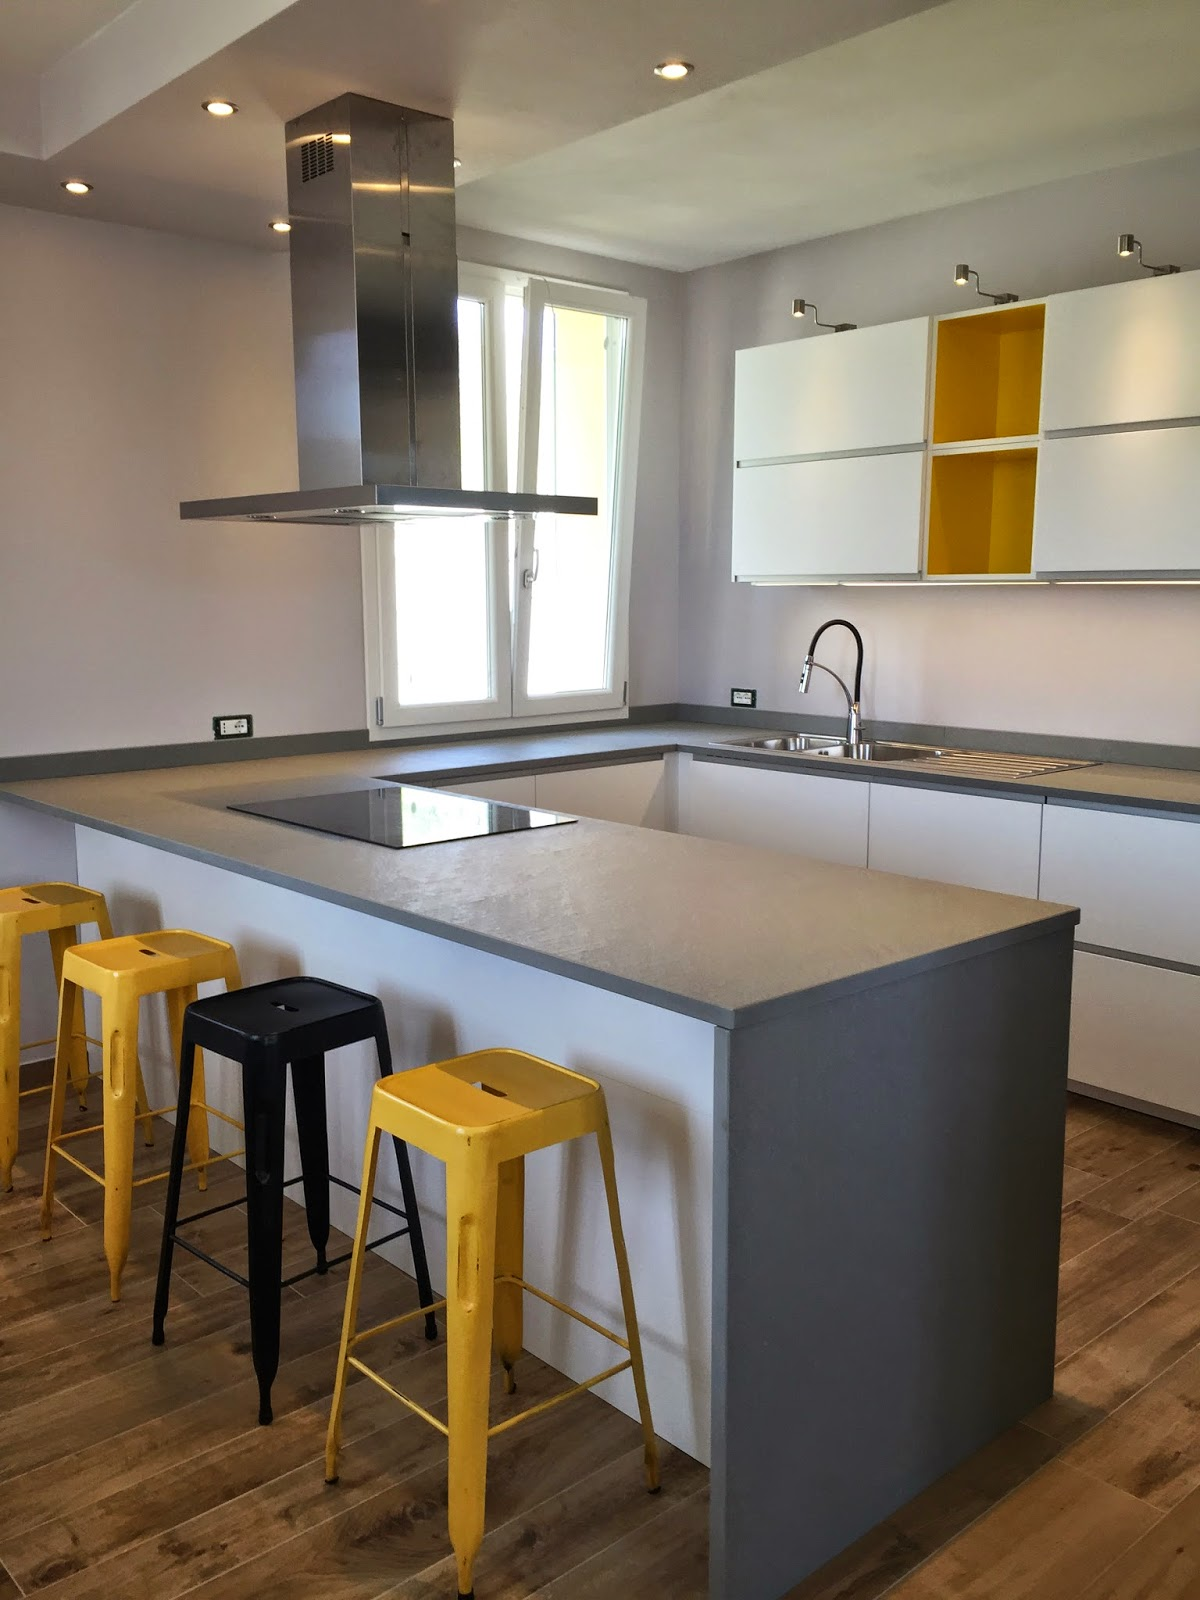 Mobili Accessori   Ikea Accessori Interni Per Mobili Cucina Dodgerelease